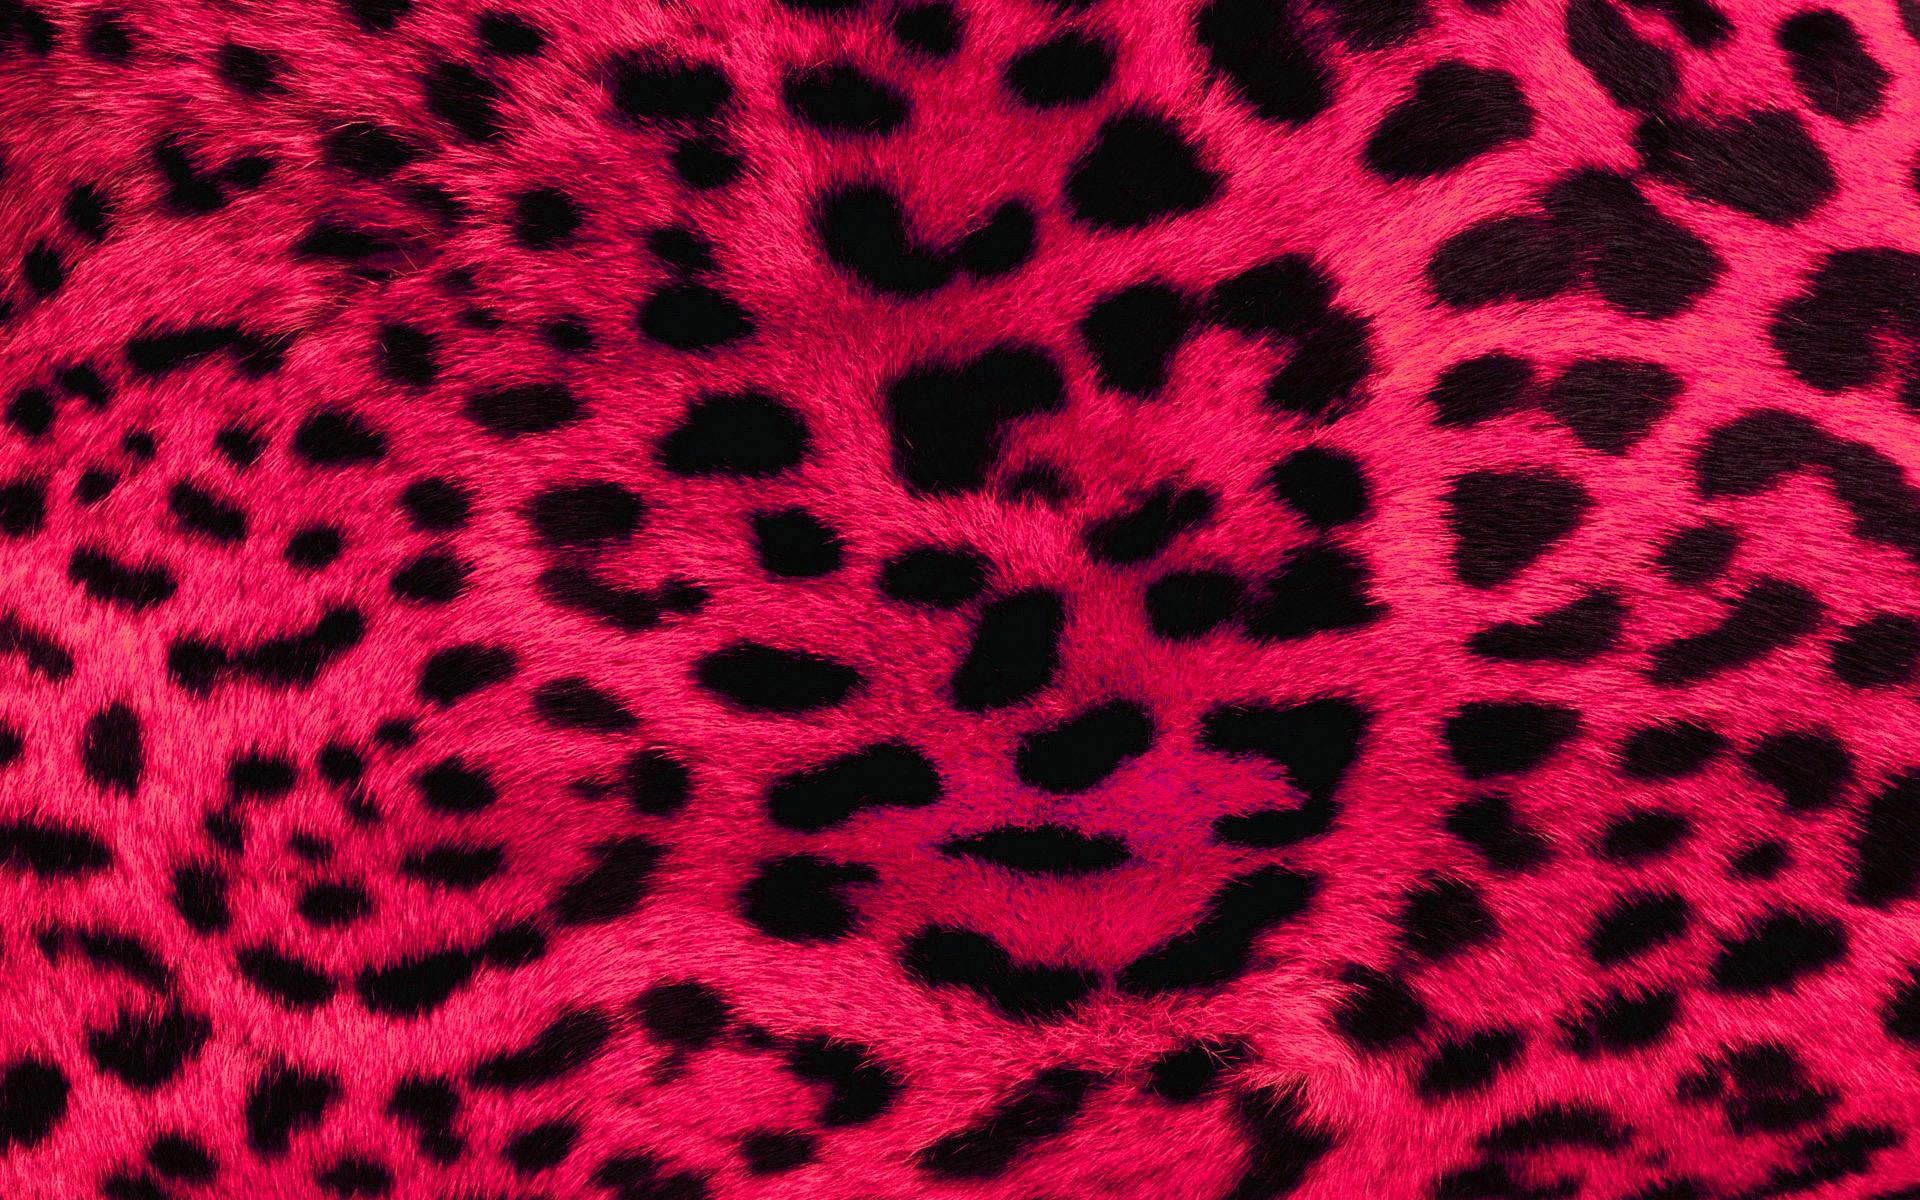 Pink Leopard Print Free Desktop Wallpaper